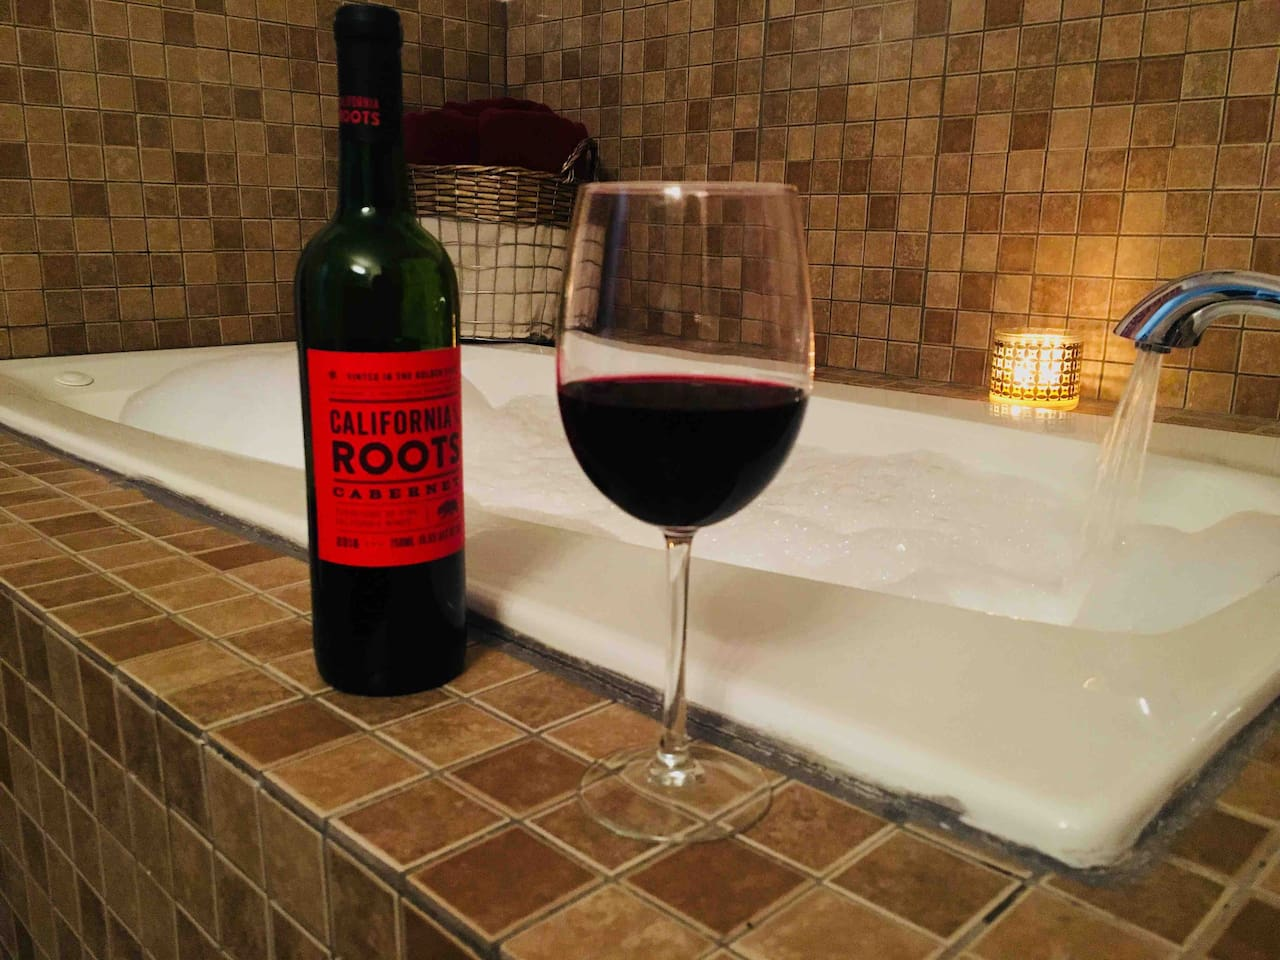 Bath time + wine = heaven